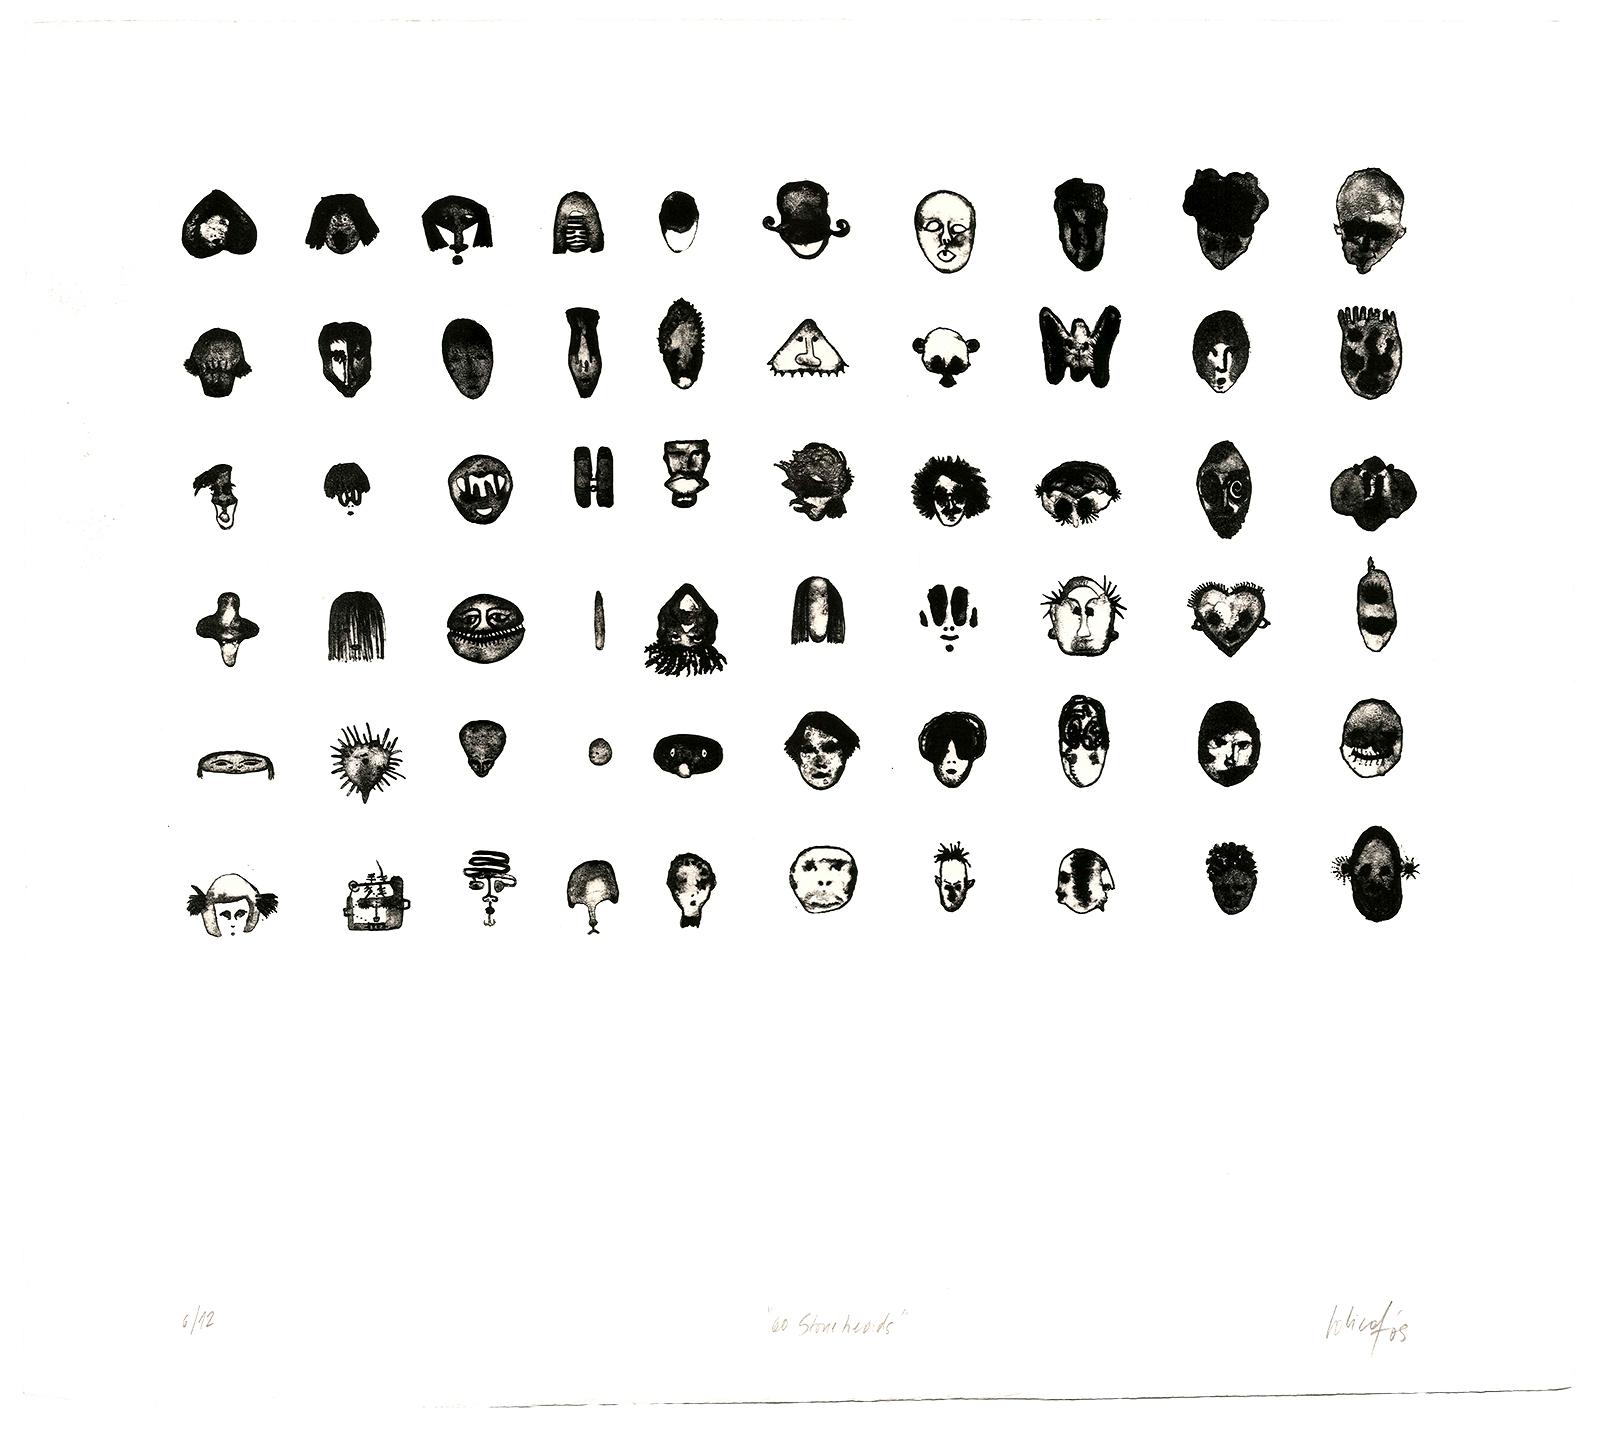 """60 Stoneheads"". Litografía. Aguada. Magnani. 56 x 50 cm."